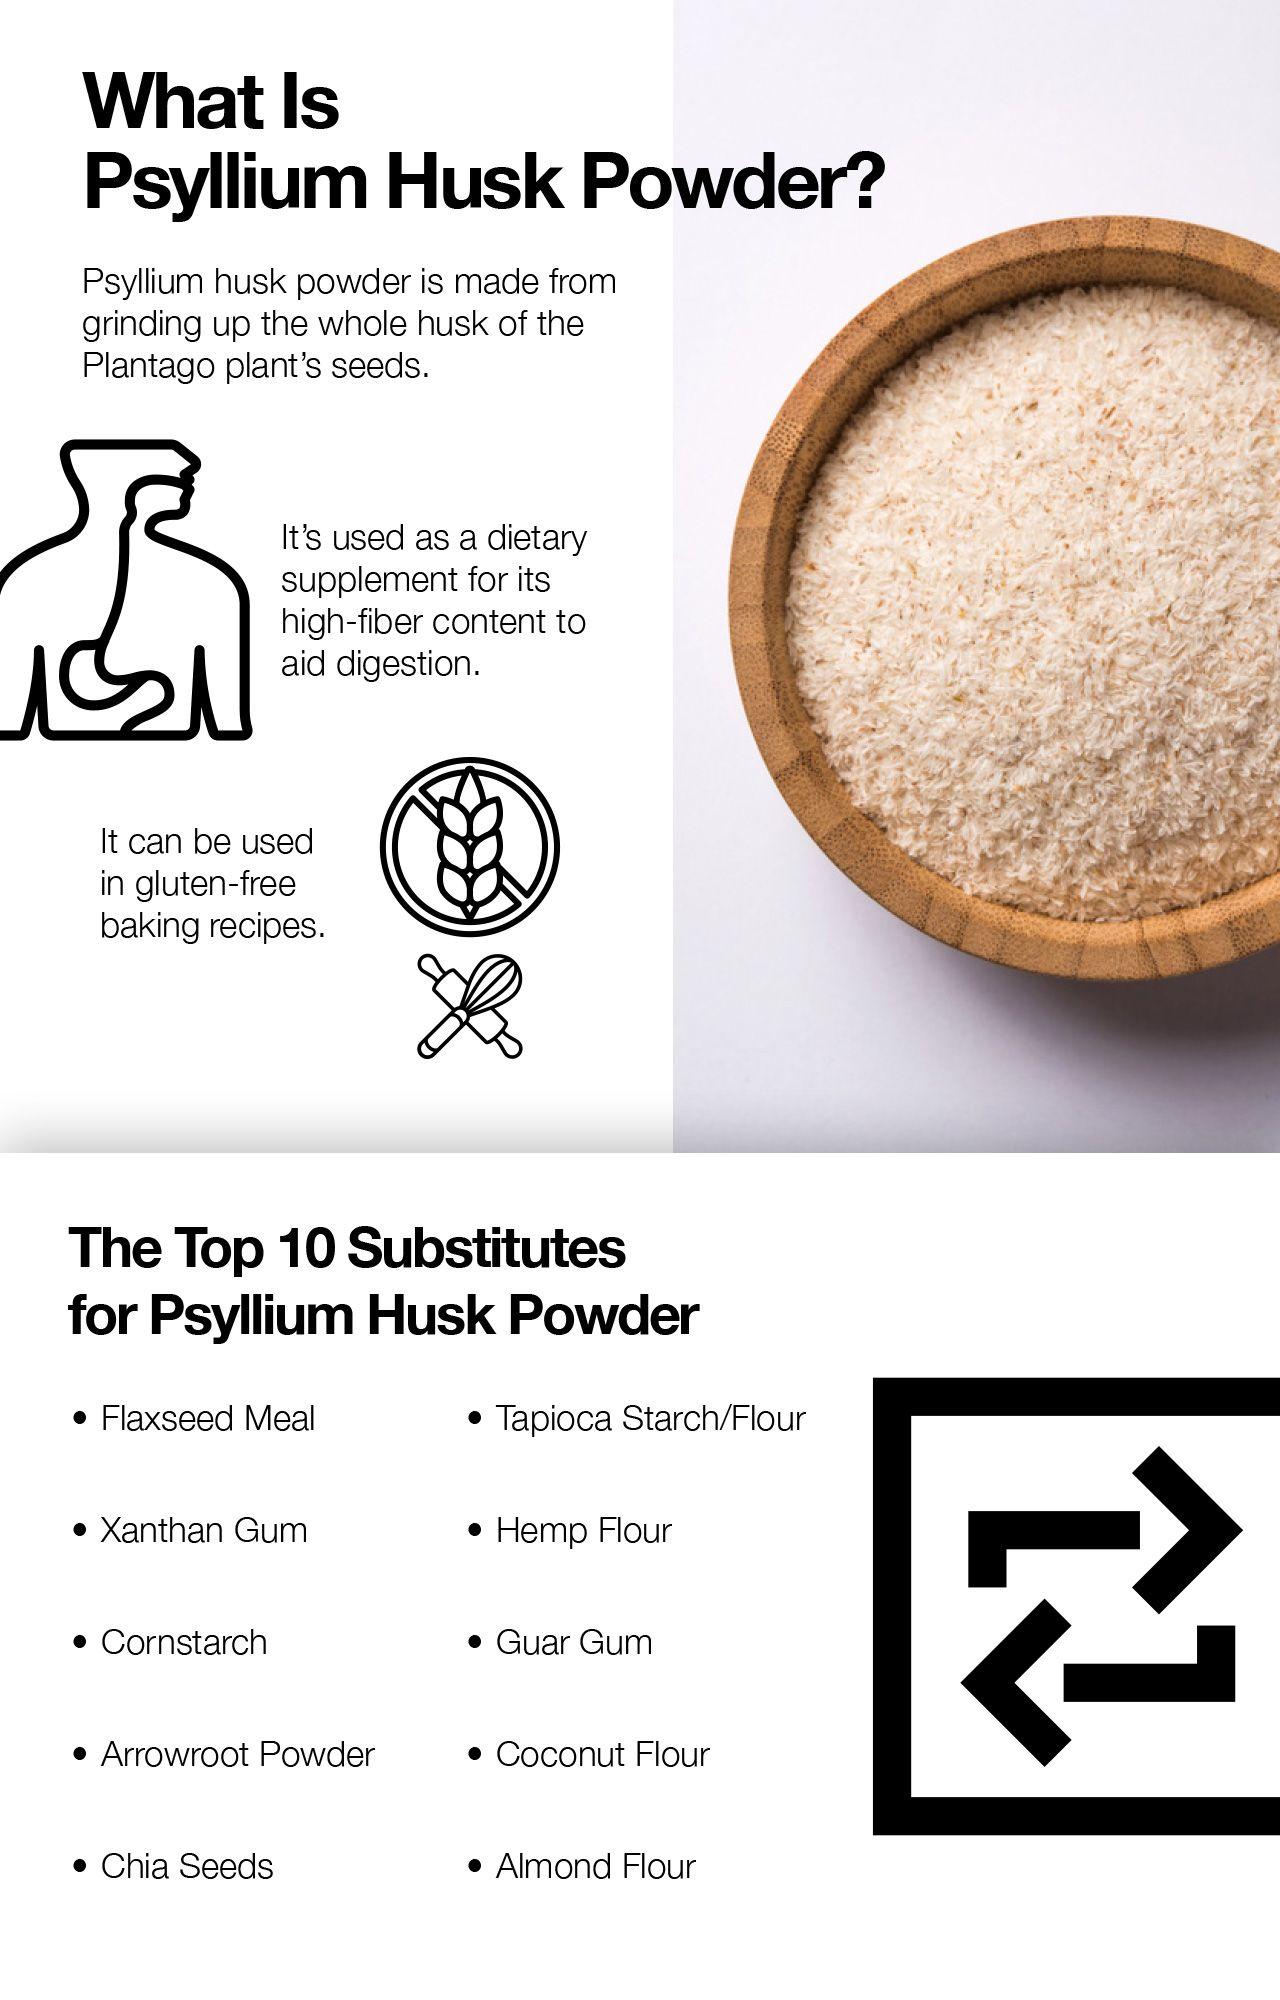 psyllium husk powder keto diet